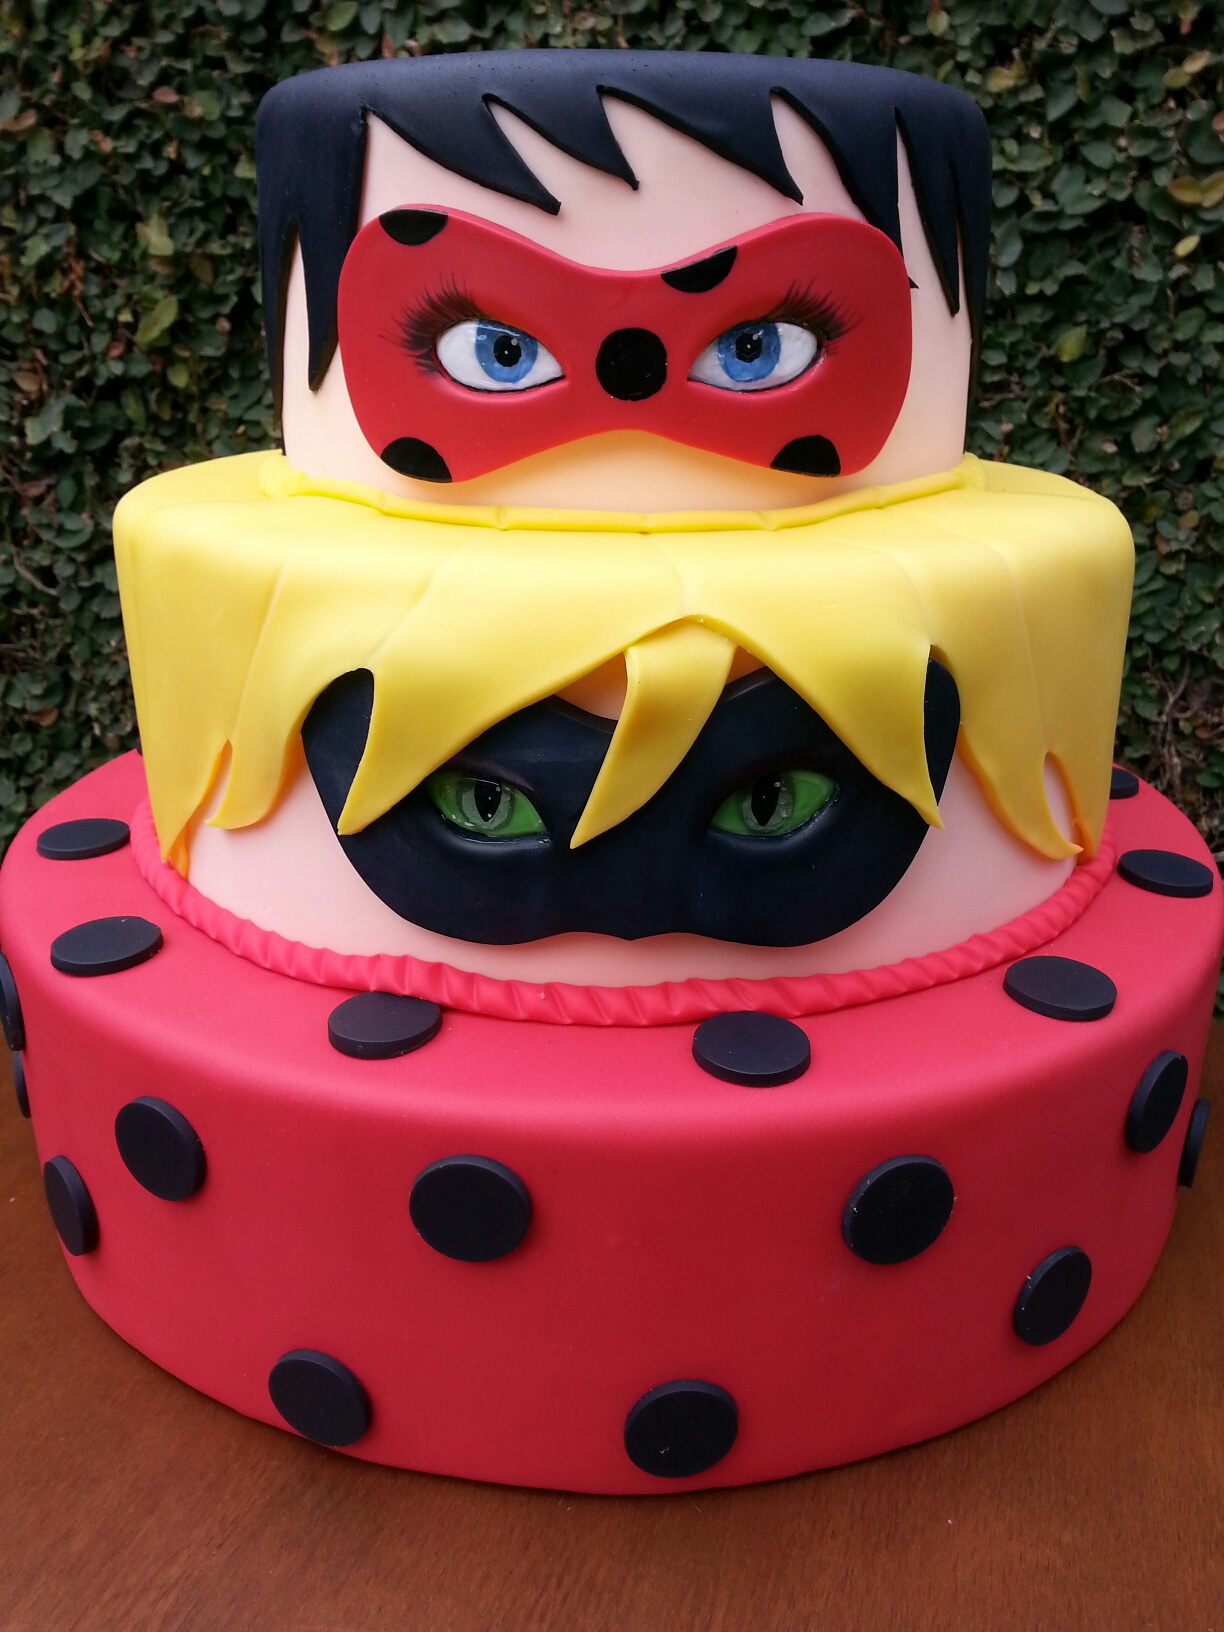 Torta ladybug 10 idee in pasta da zucchero di miracolous for Www home piani foto